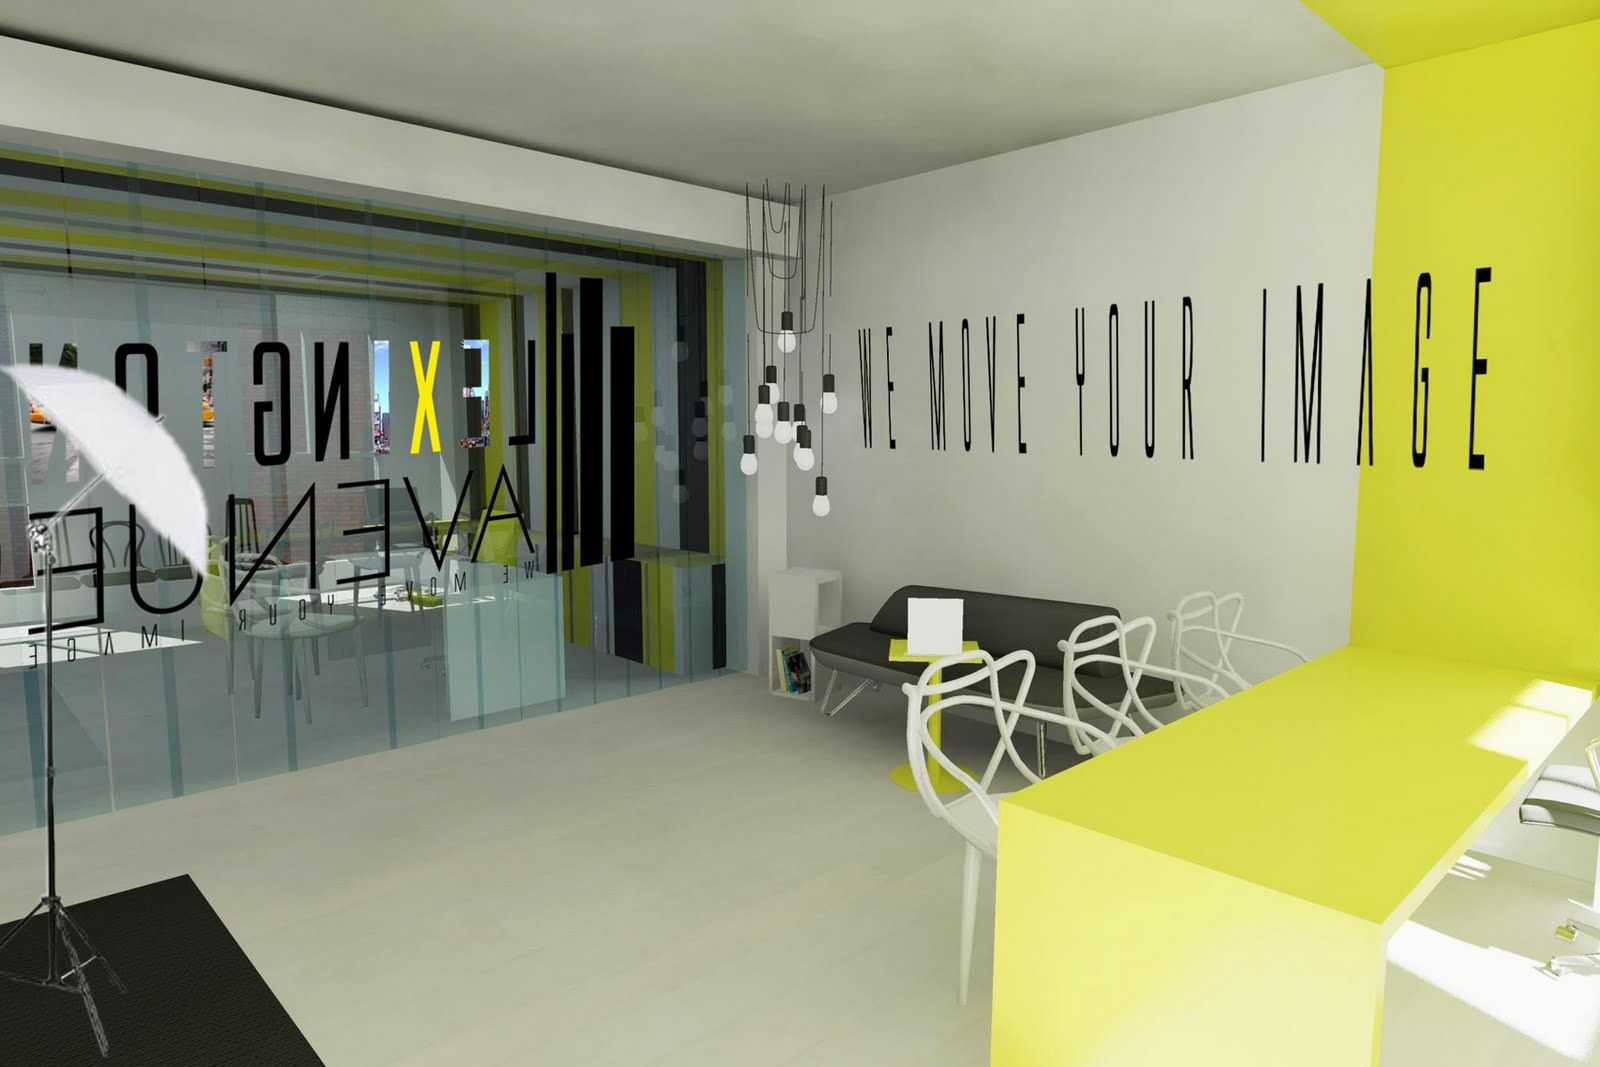 oficinas de dise o2 oficinas pinterest. Black Bedroom Furniture Sets. Home Design Ideas